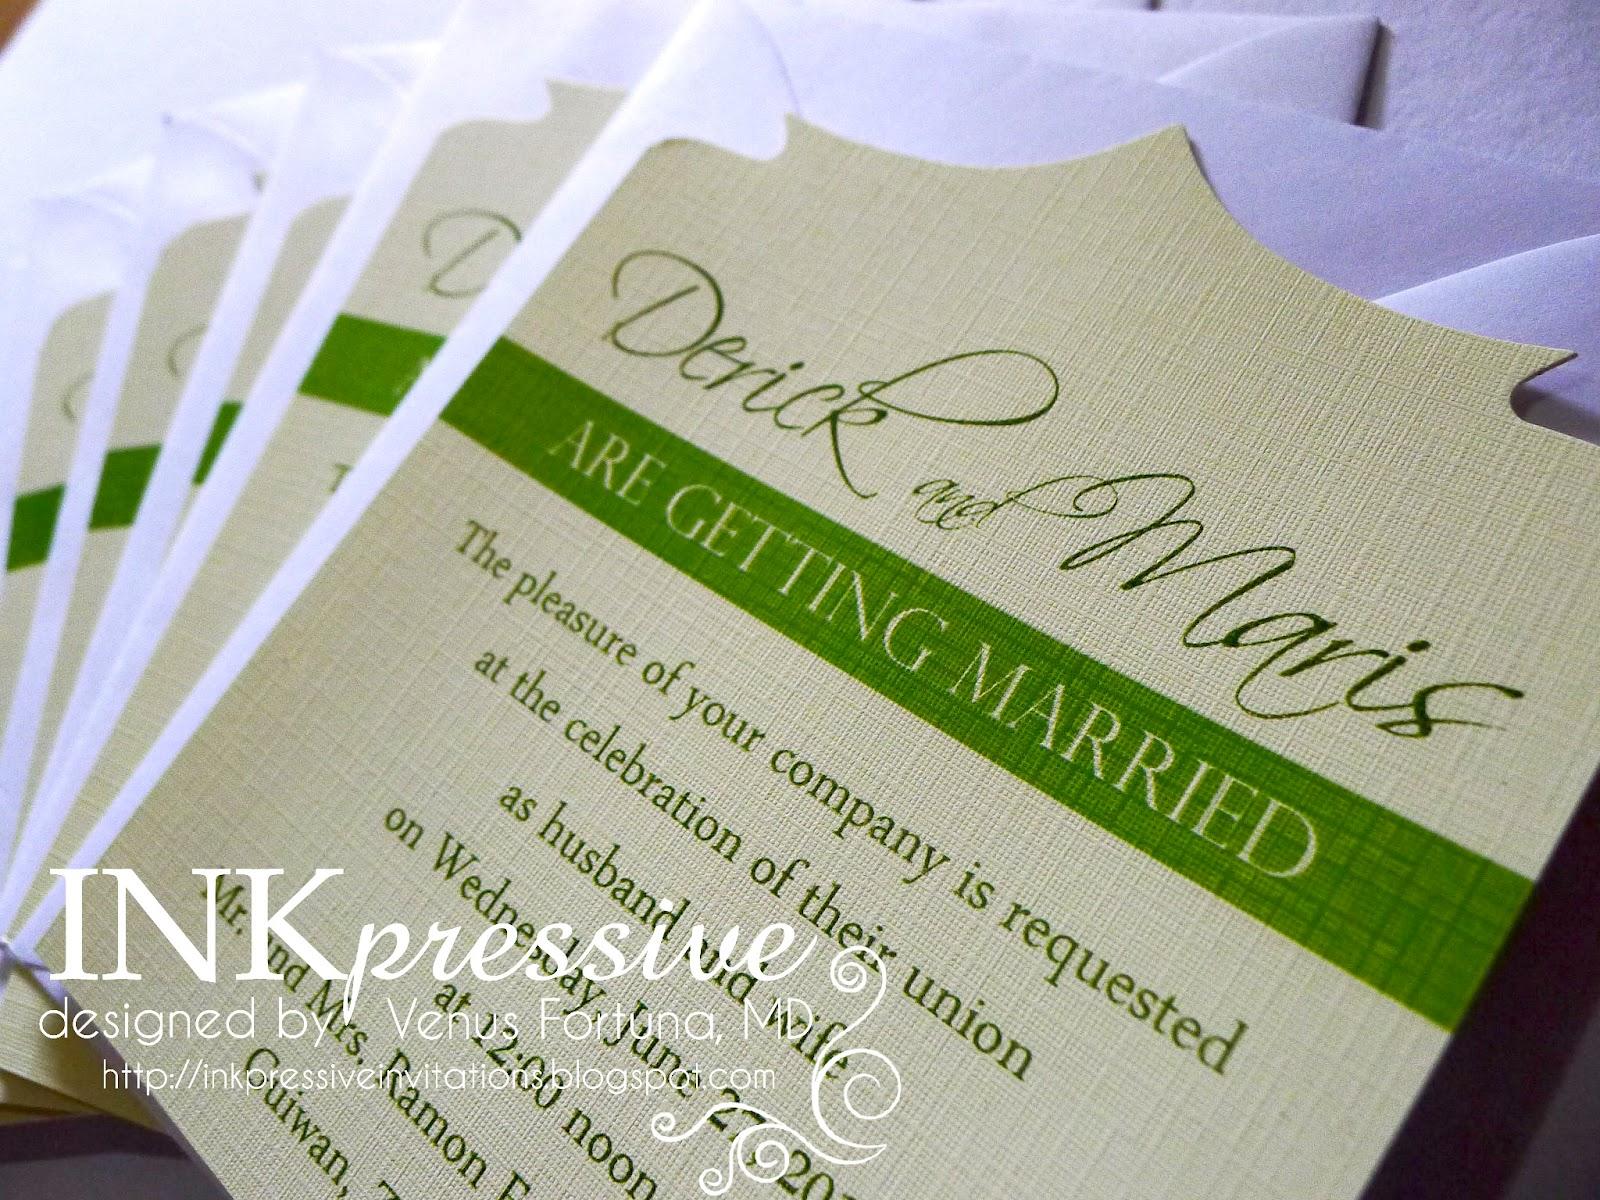 INKPRESSIVE INVITATIONS: June 2012